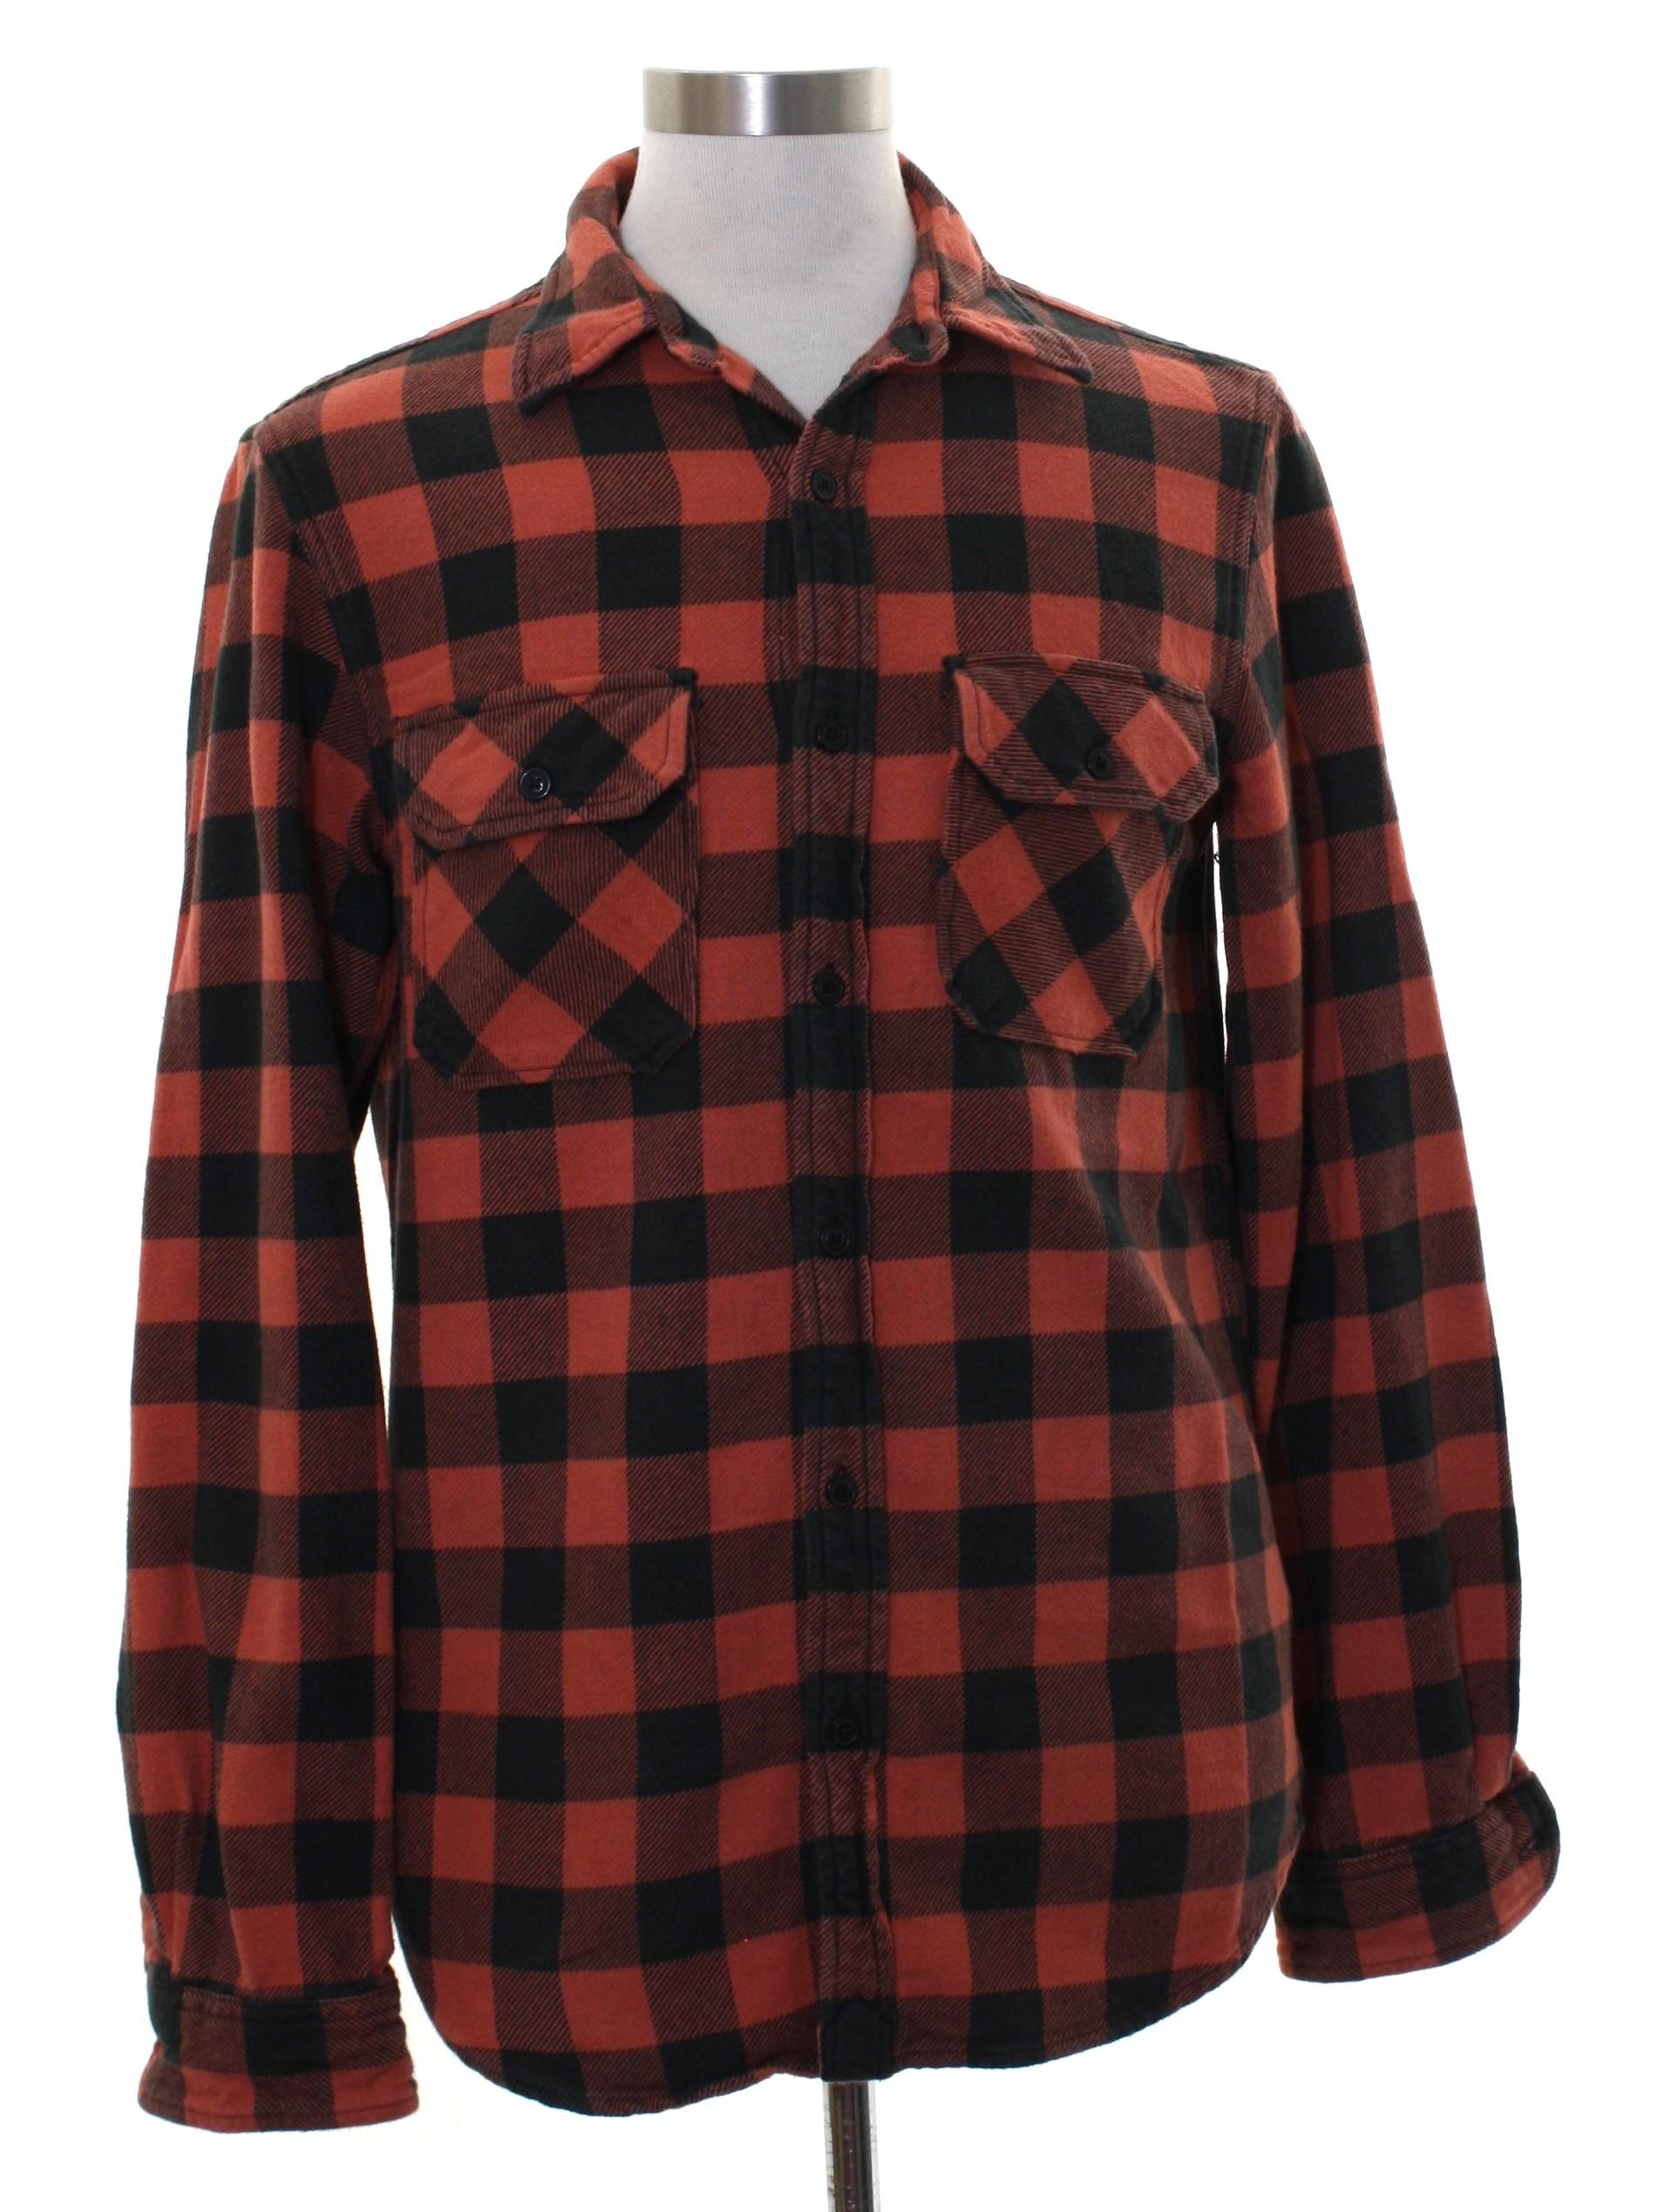 388a4868 Achat ralph lauren men's flannel shirts - 62% OFF! - www.joyet ...